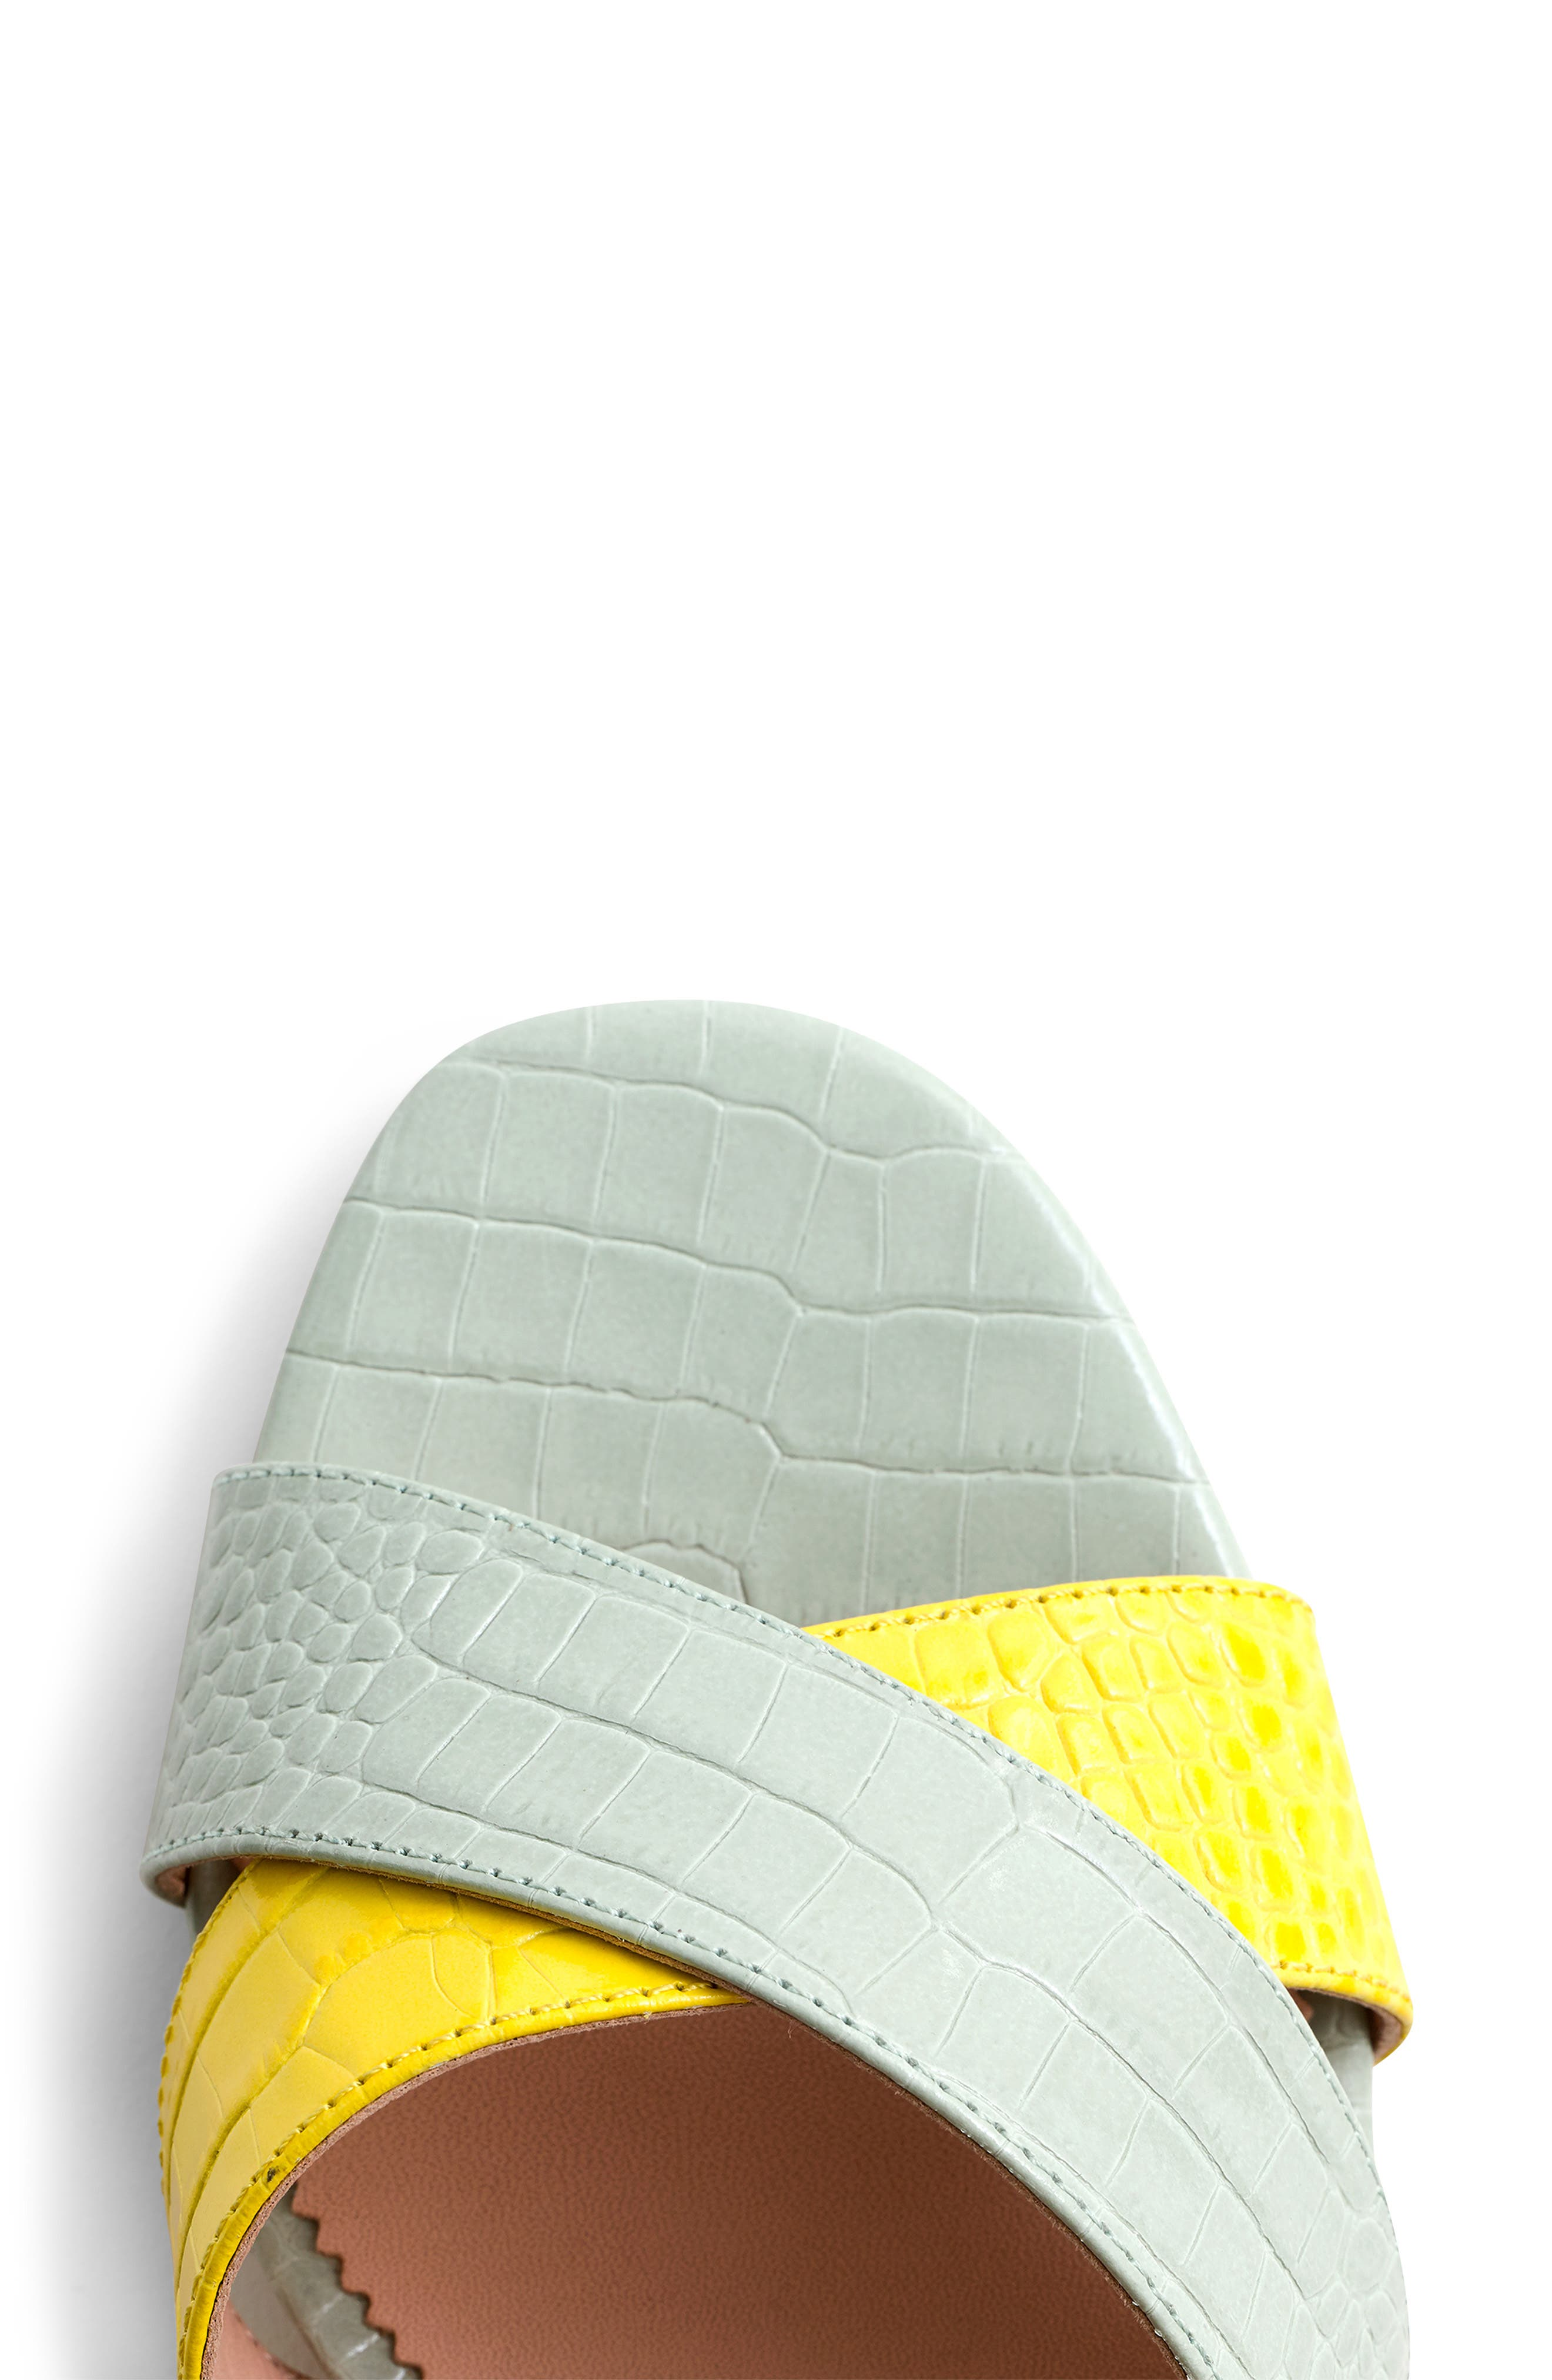 Penny Colorblock Faux Croc Slide Sandal,                             Alternate thumbnail 3, color,                             BRIGHT YOLK SUEDE